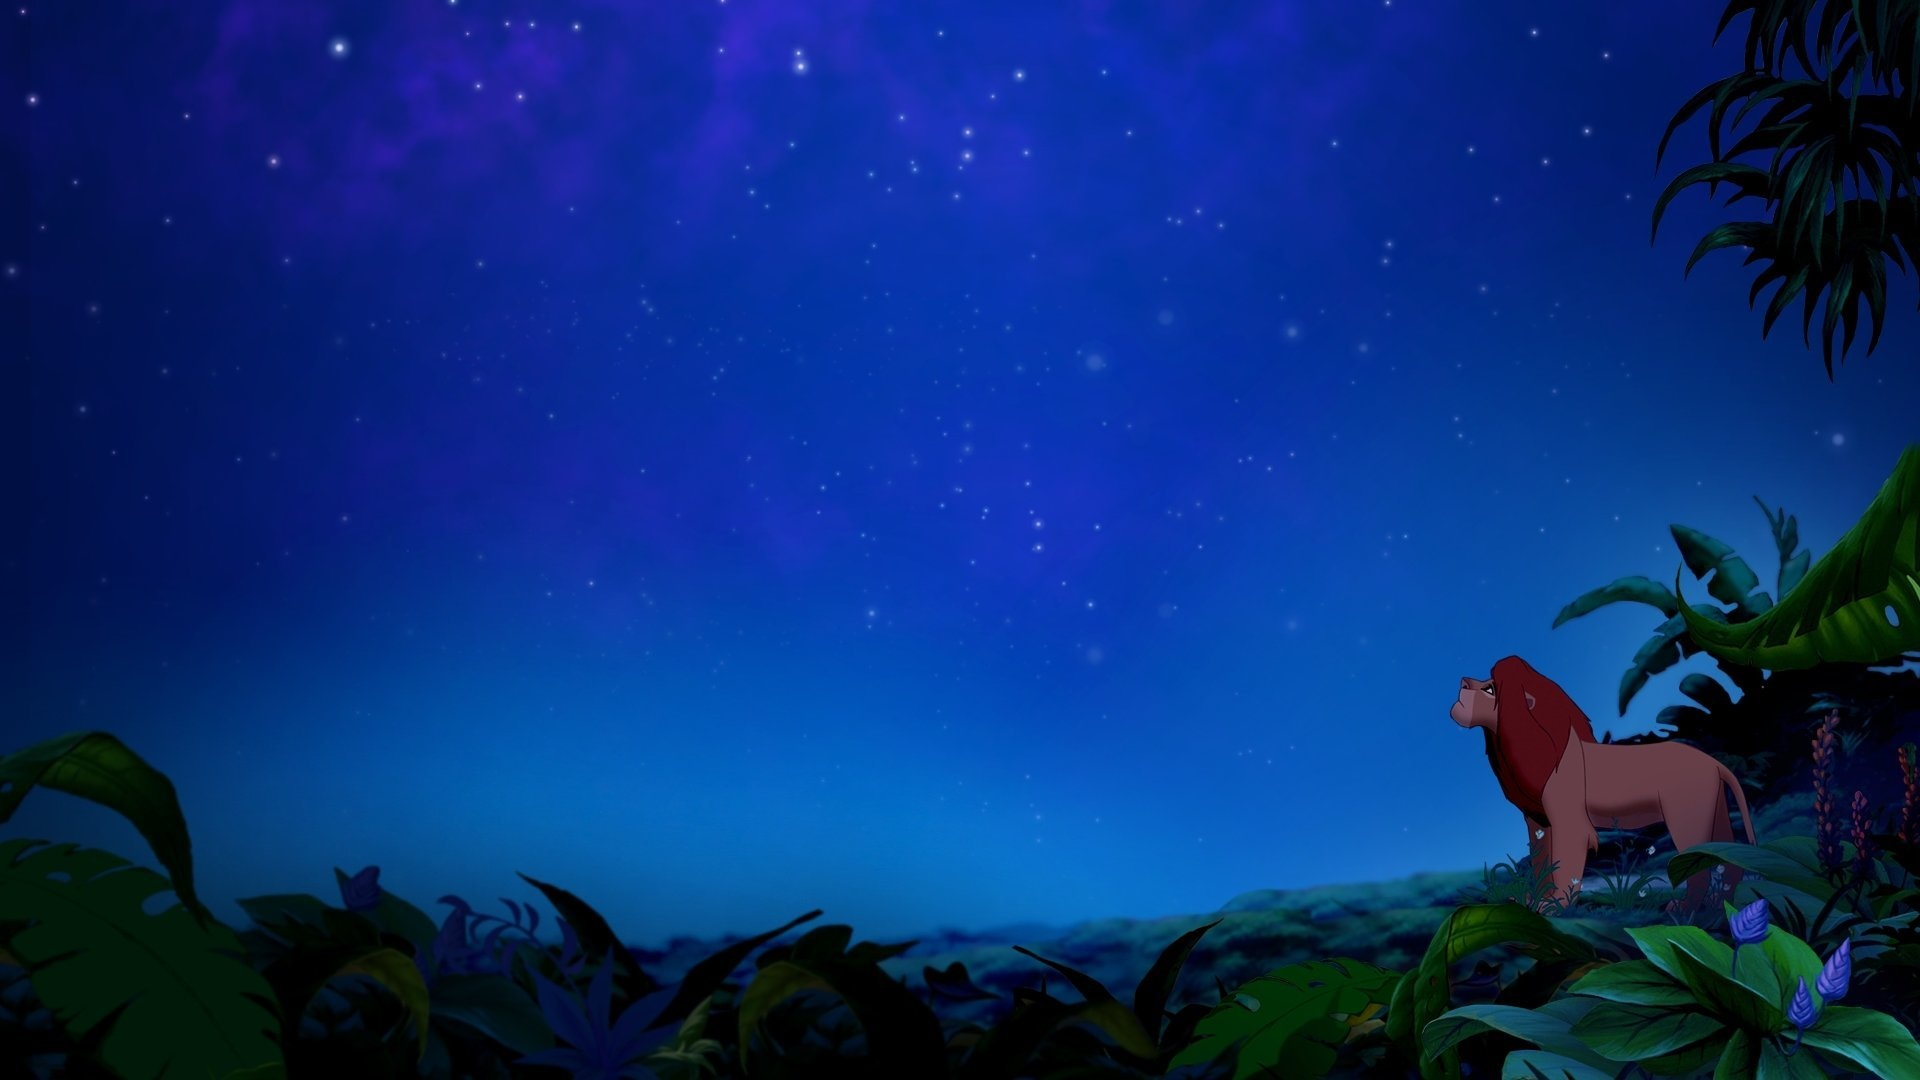 Disney cool background